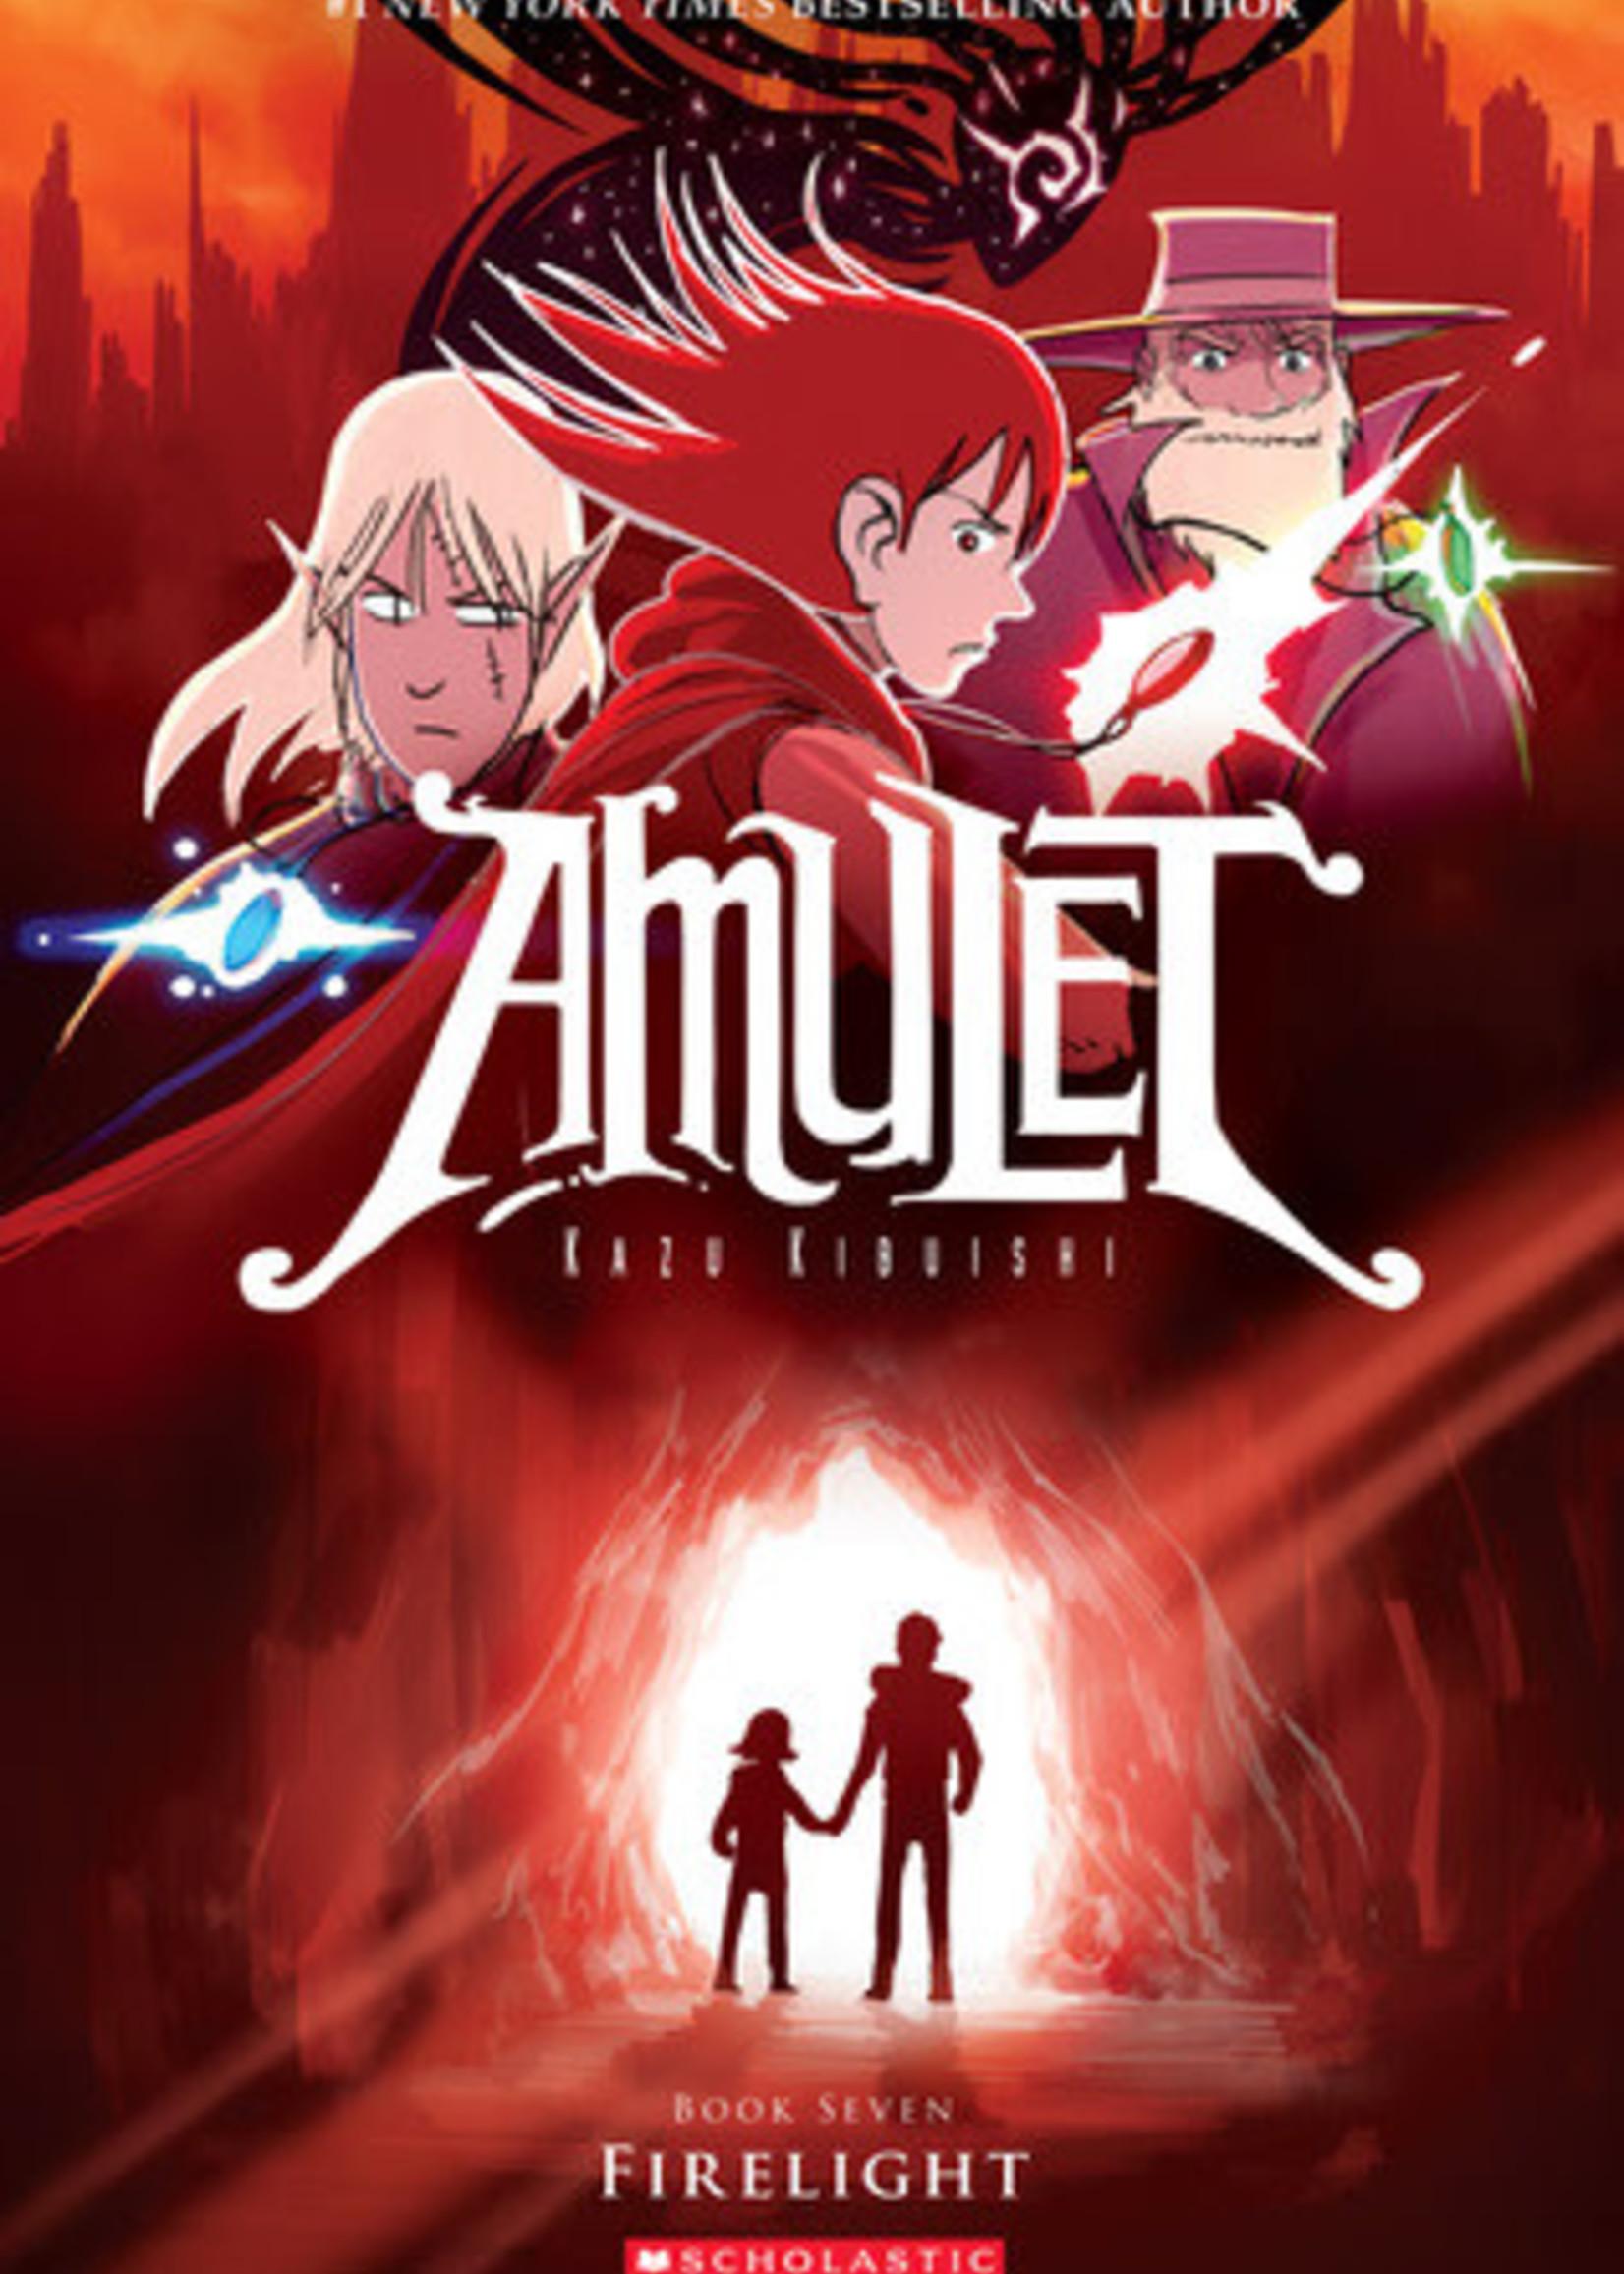 Firelight (Amulet #7) by Kazu Kibuishi